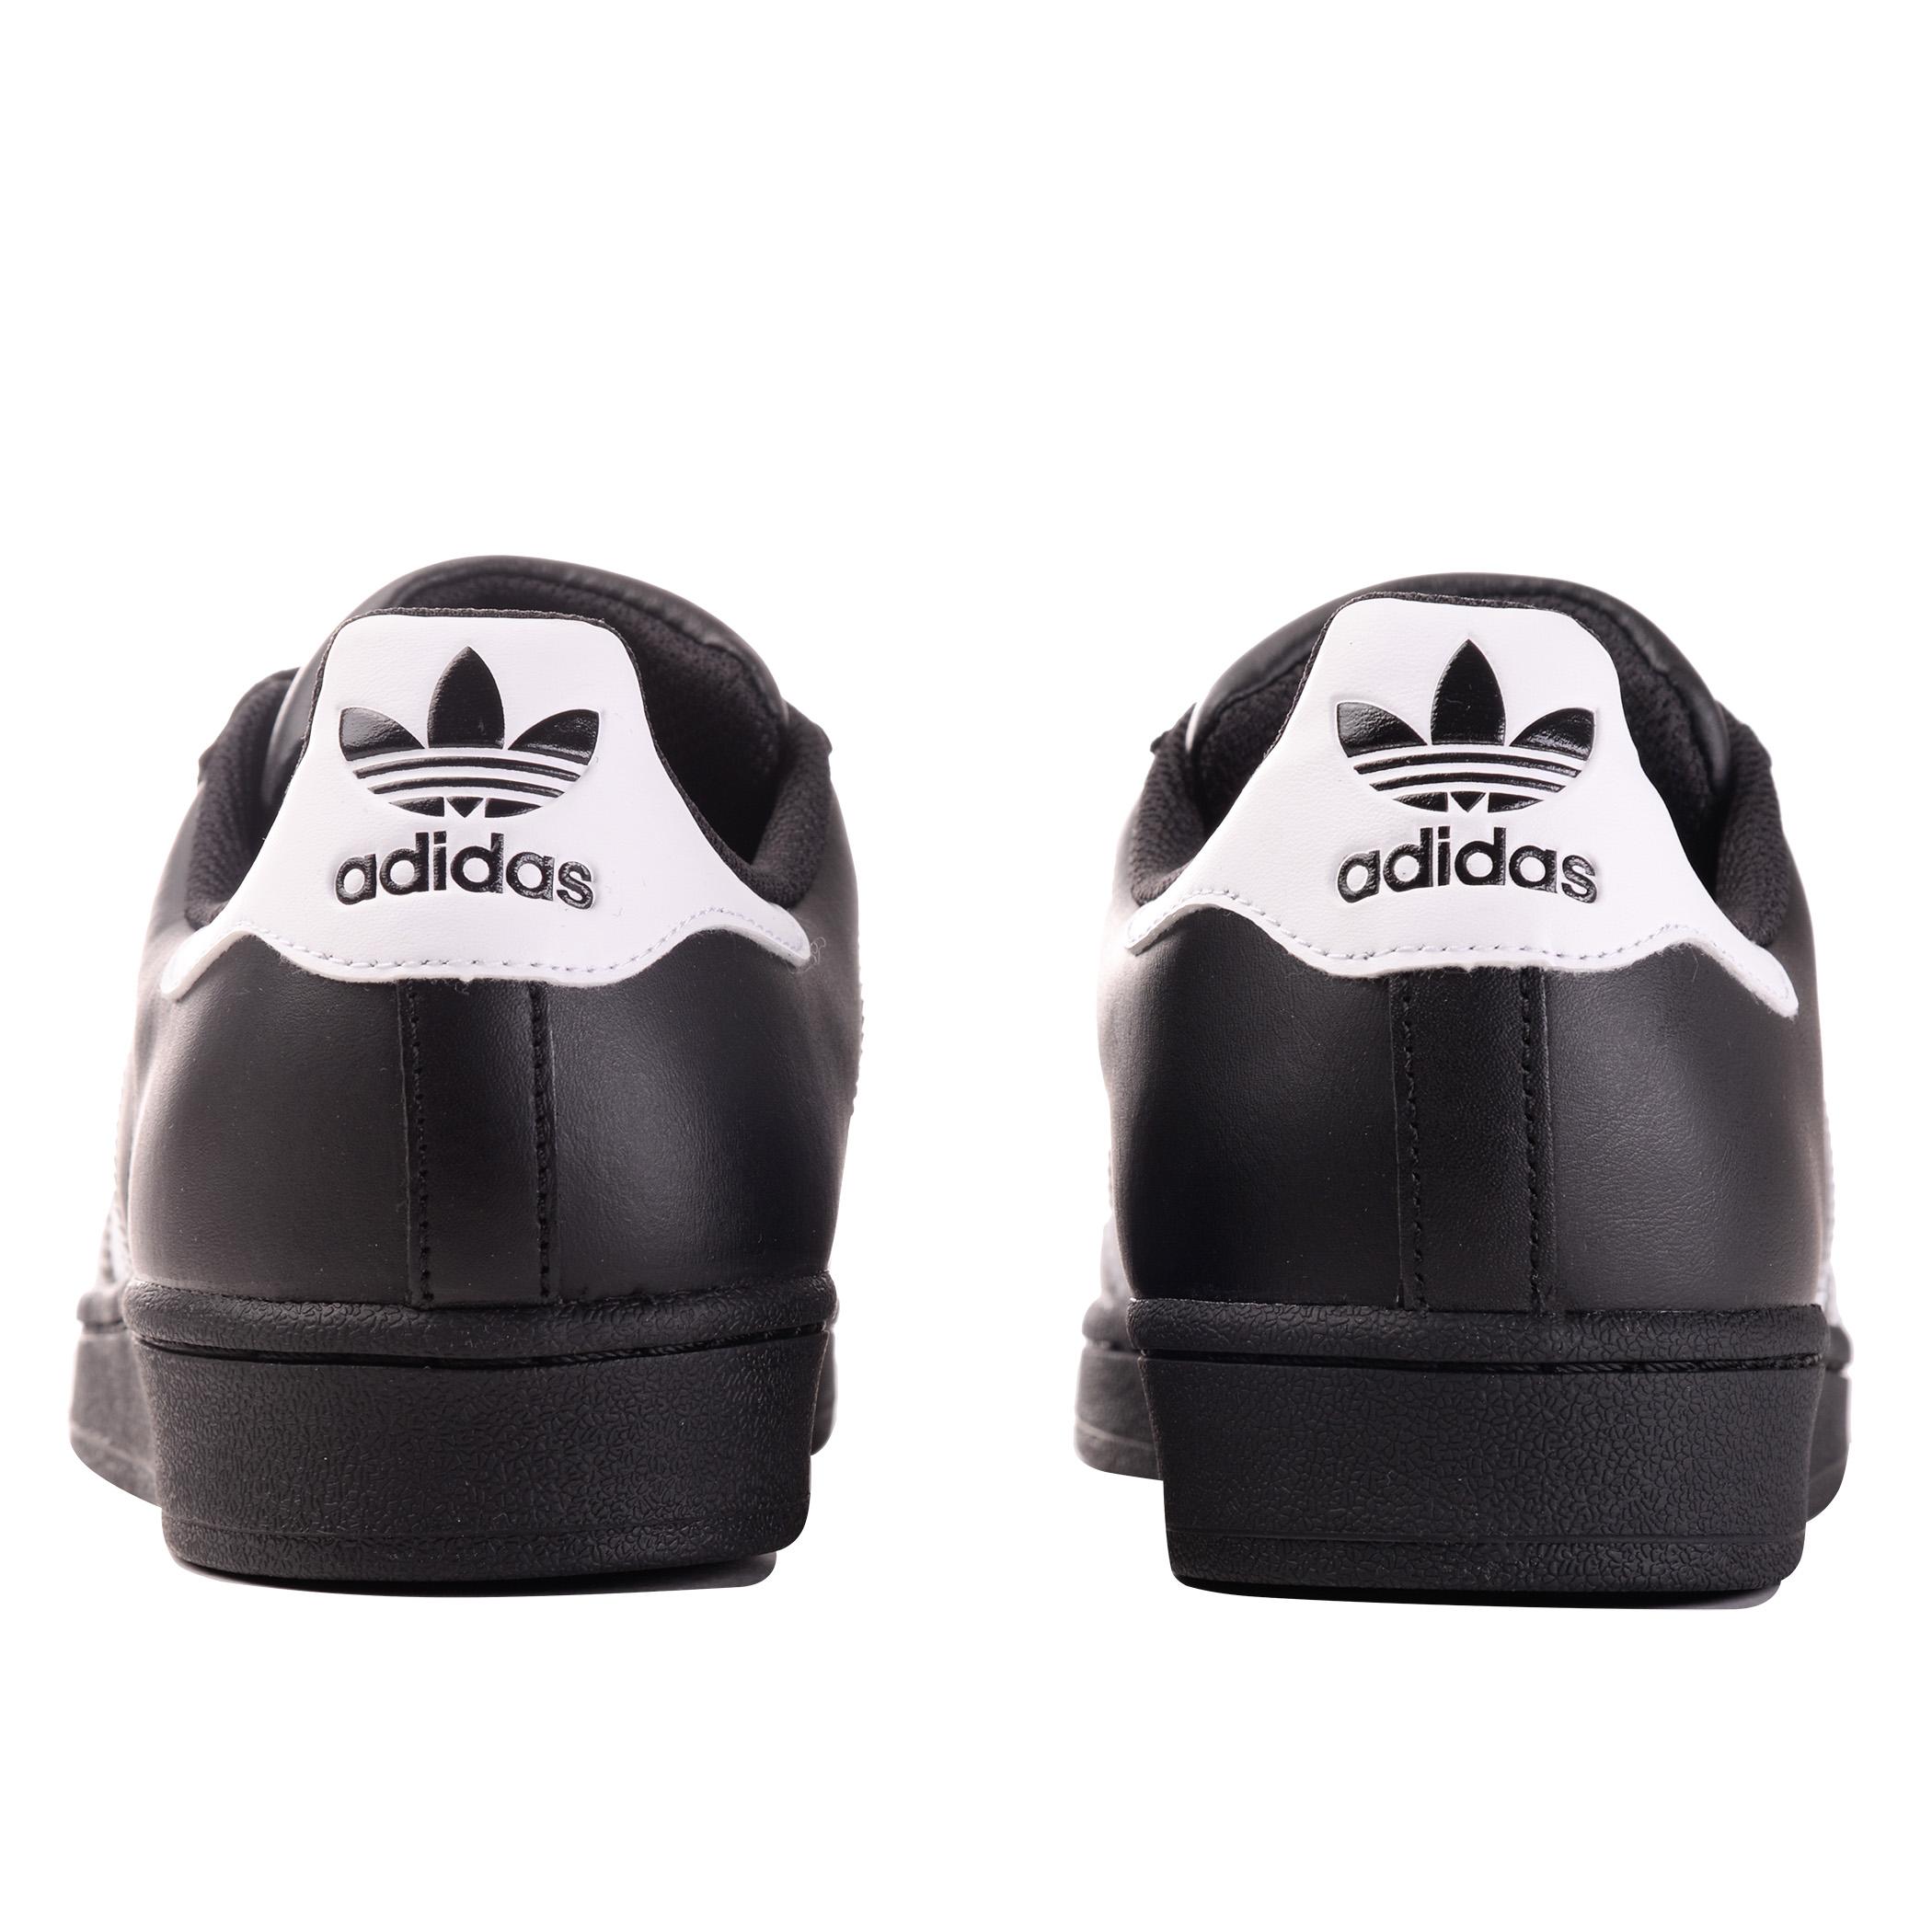 ac74098a47dd Кроссовки от adidas Originals (B27140) - продажа, цена, фото, описание